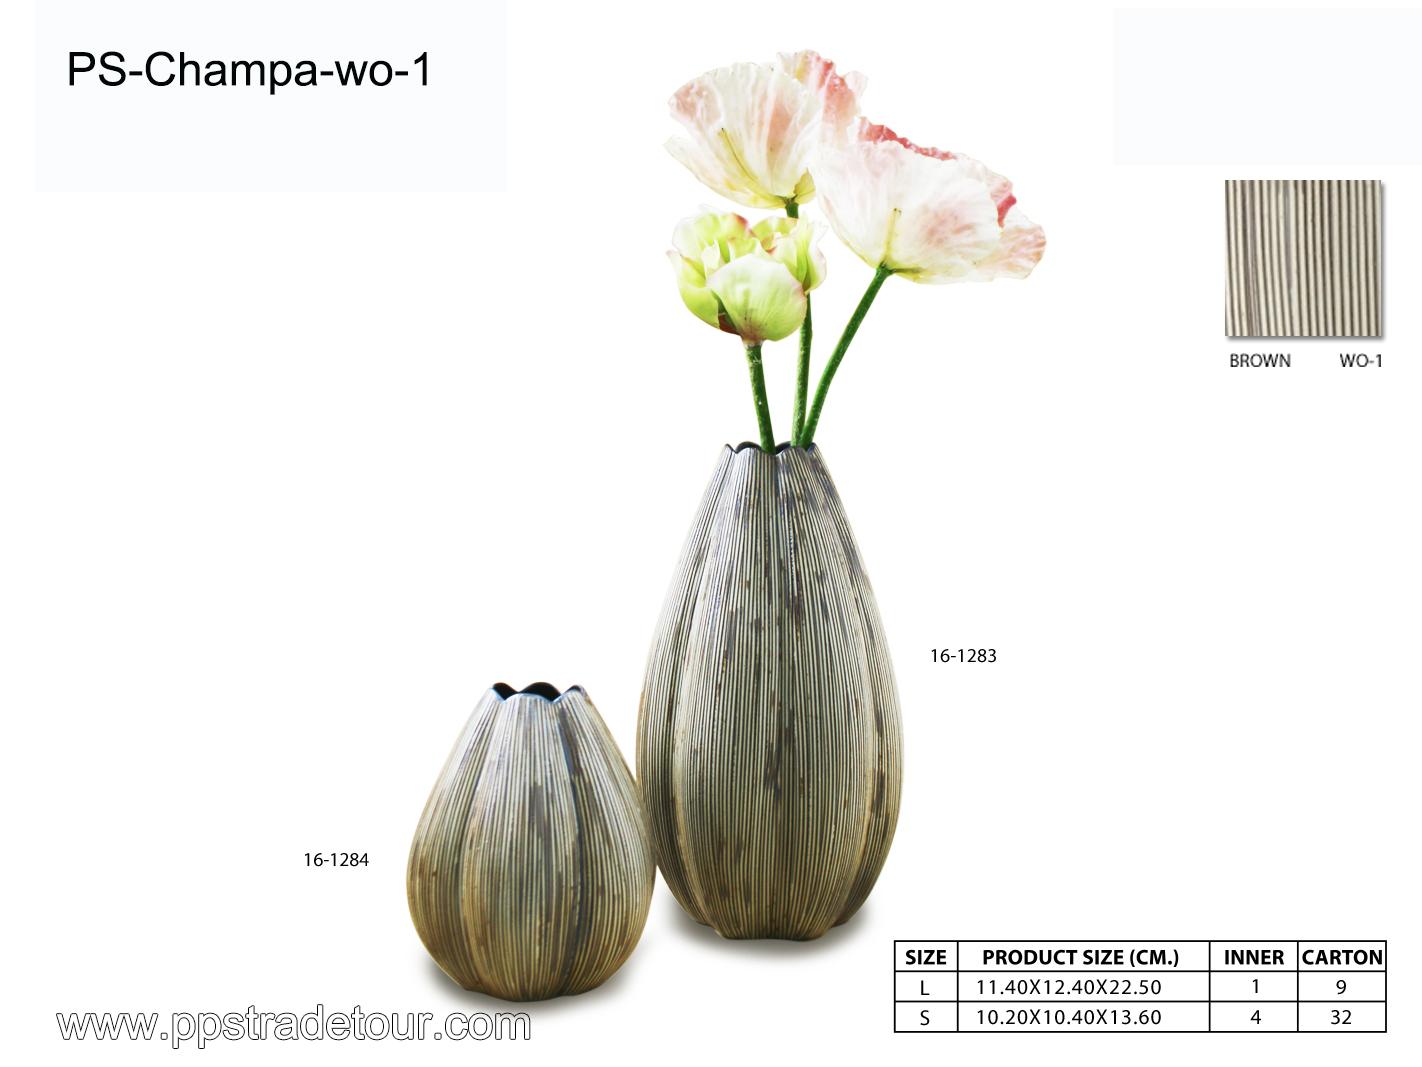 PSCV-champa-Wo-1